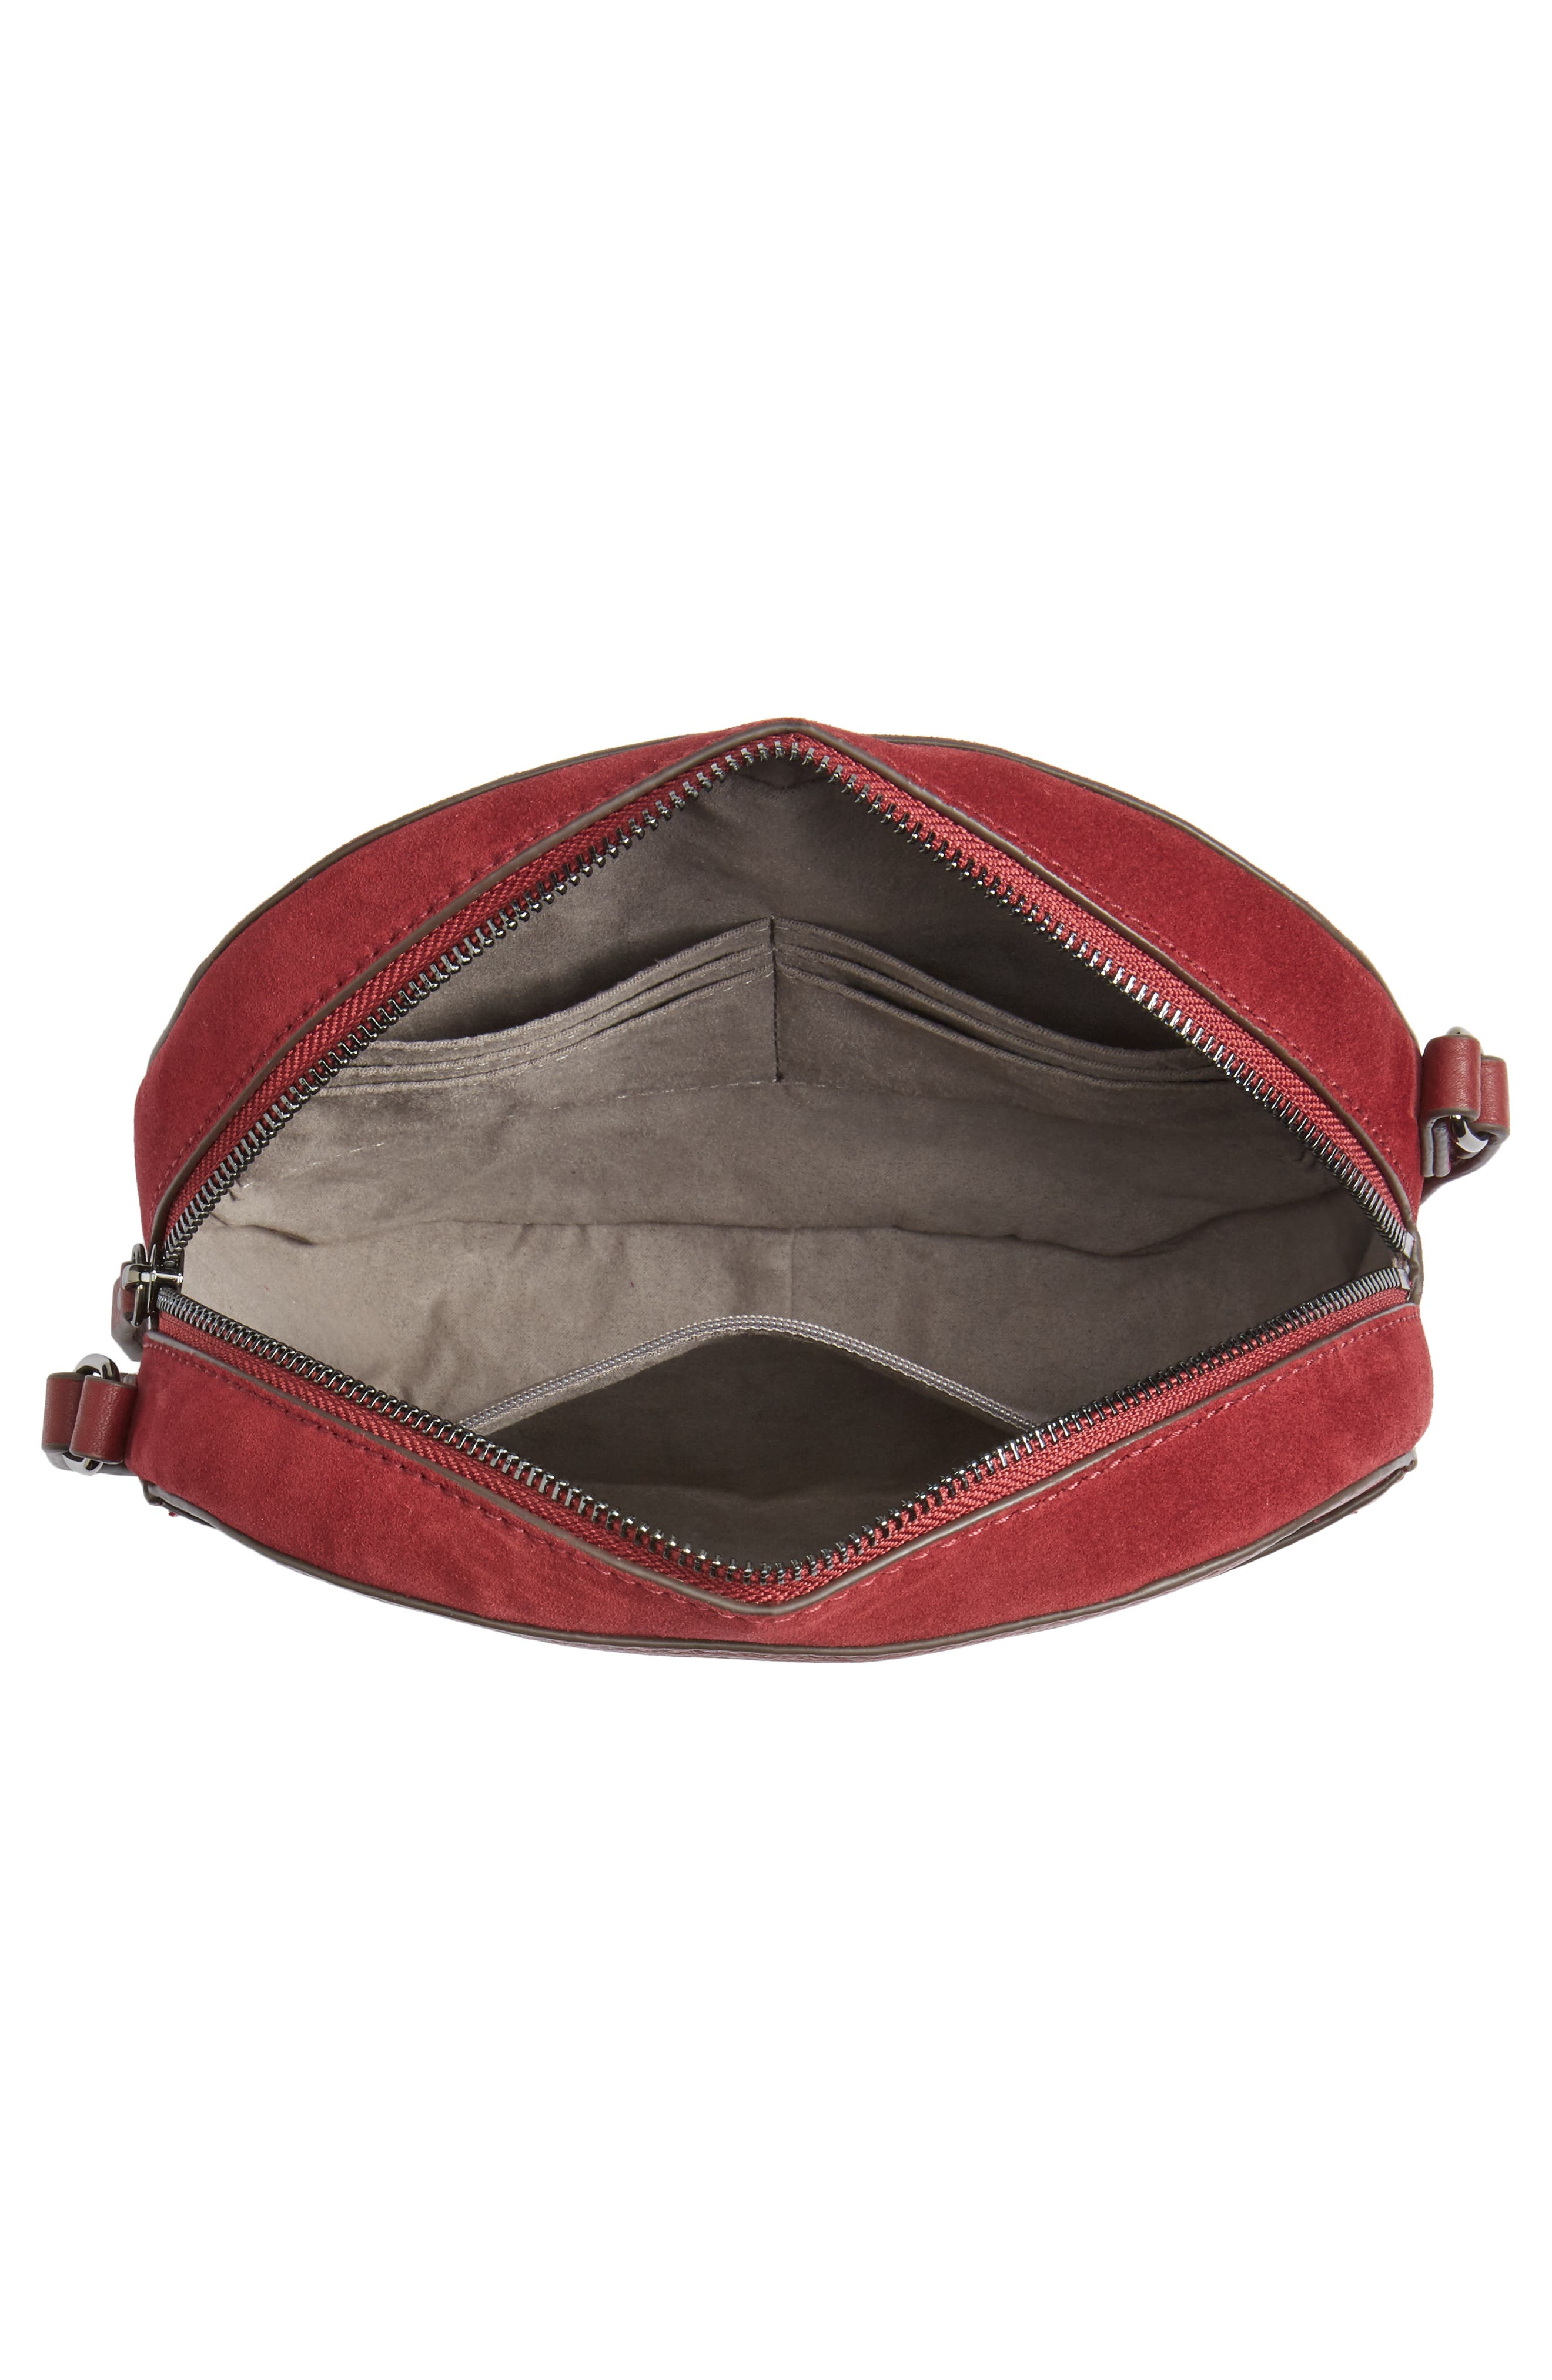 Alternate Image 3  - Vince Camuto Areli Suede & Leather Crossbody Bag